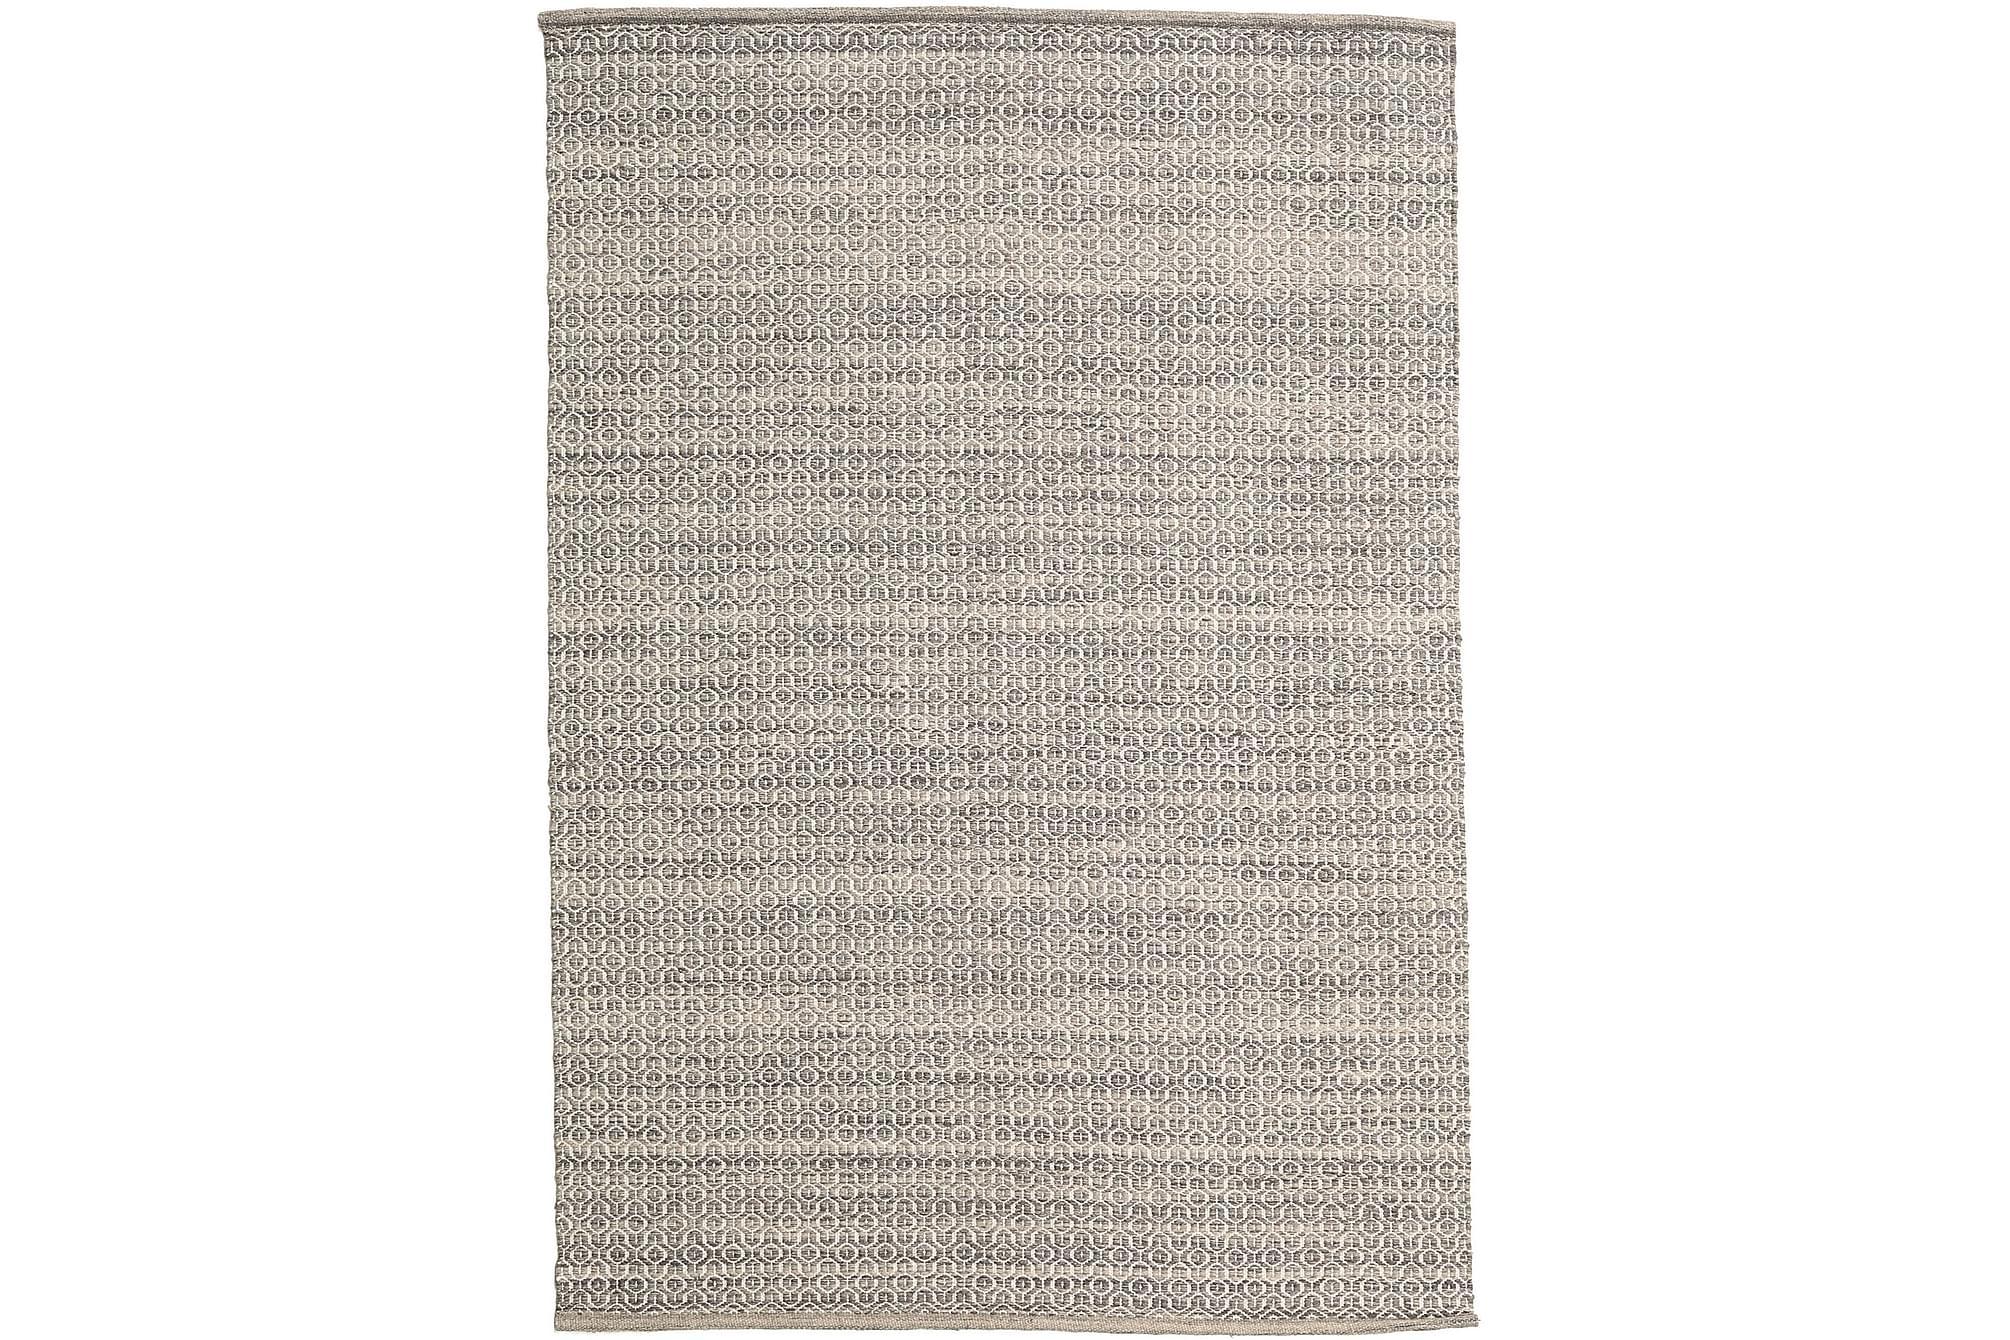 ALVA Matta 160x230 Brun/Vit, Stora mattor